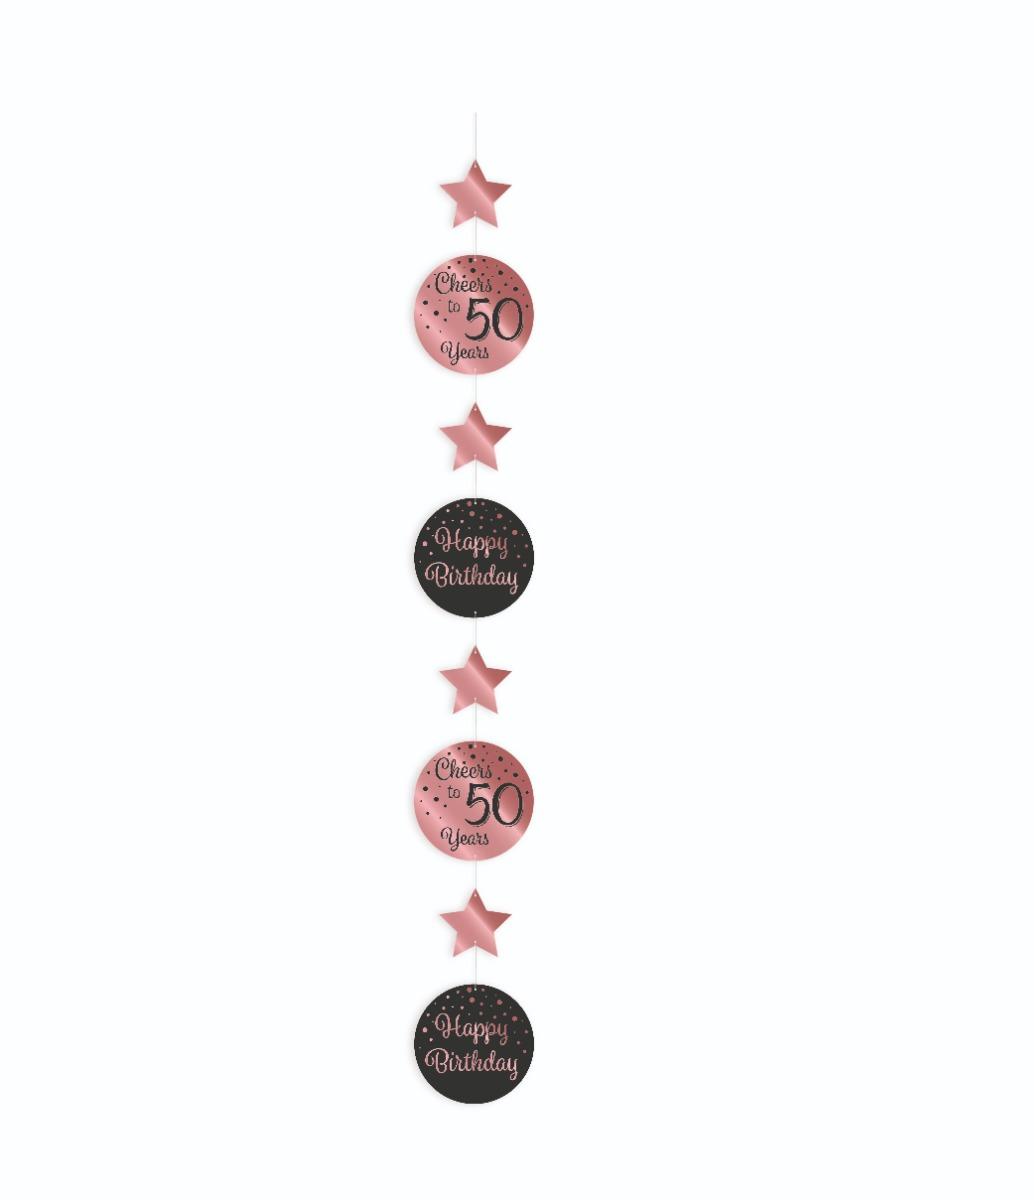 Paperdreams Hangslinger roze/zwart - 50